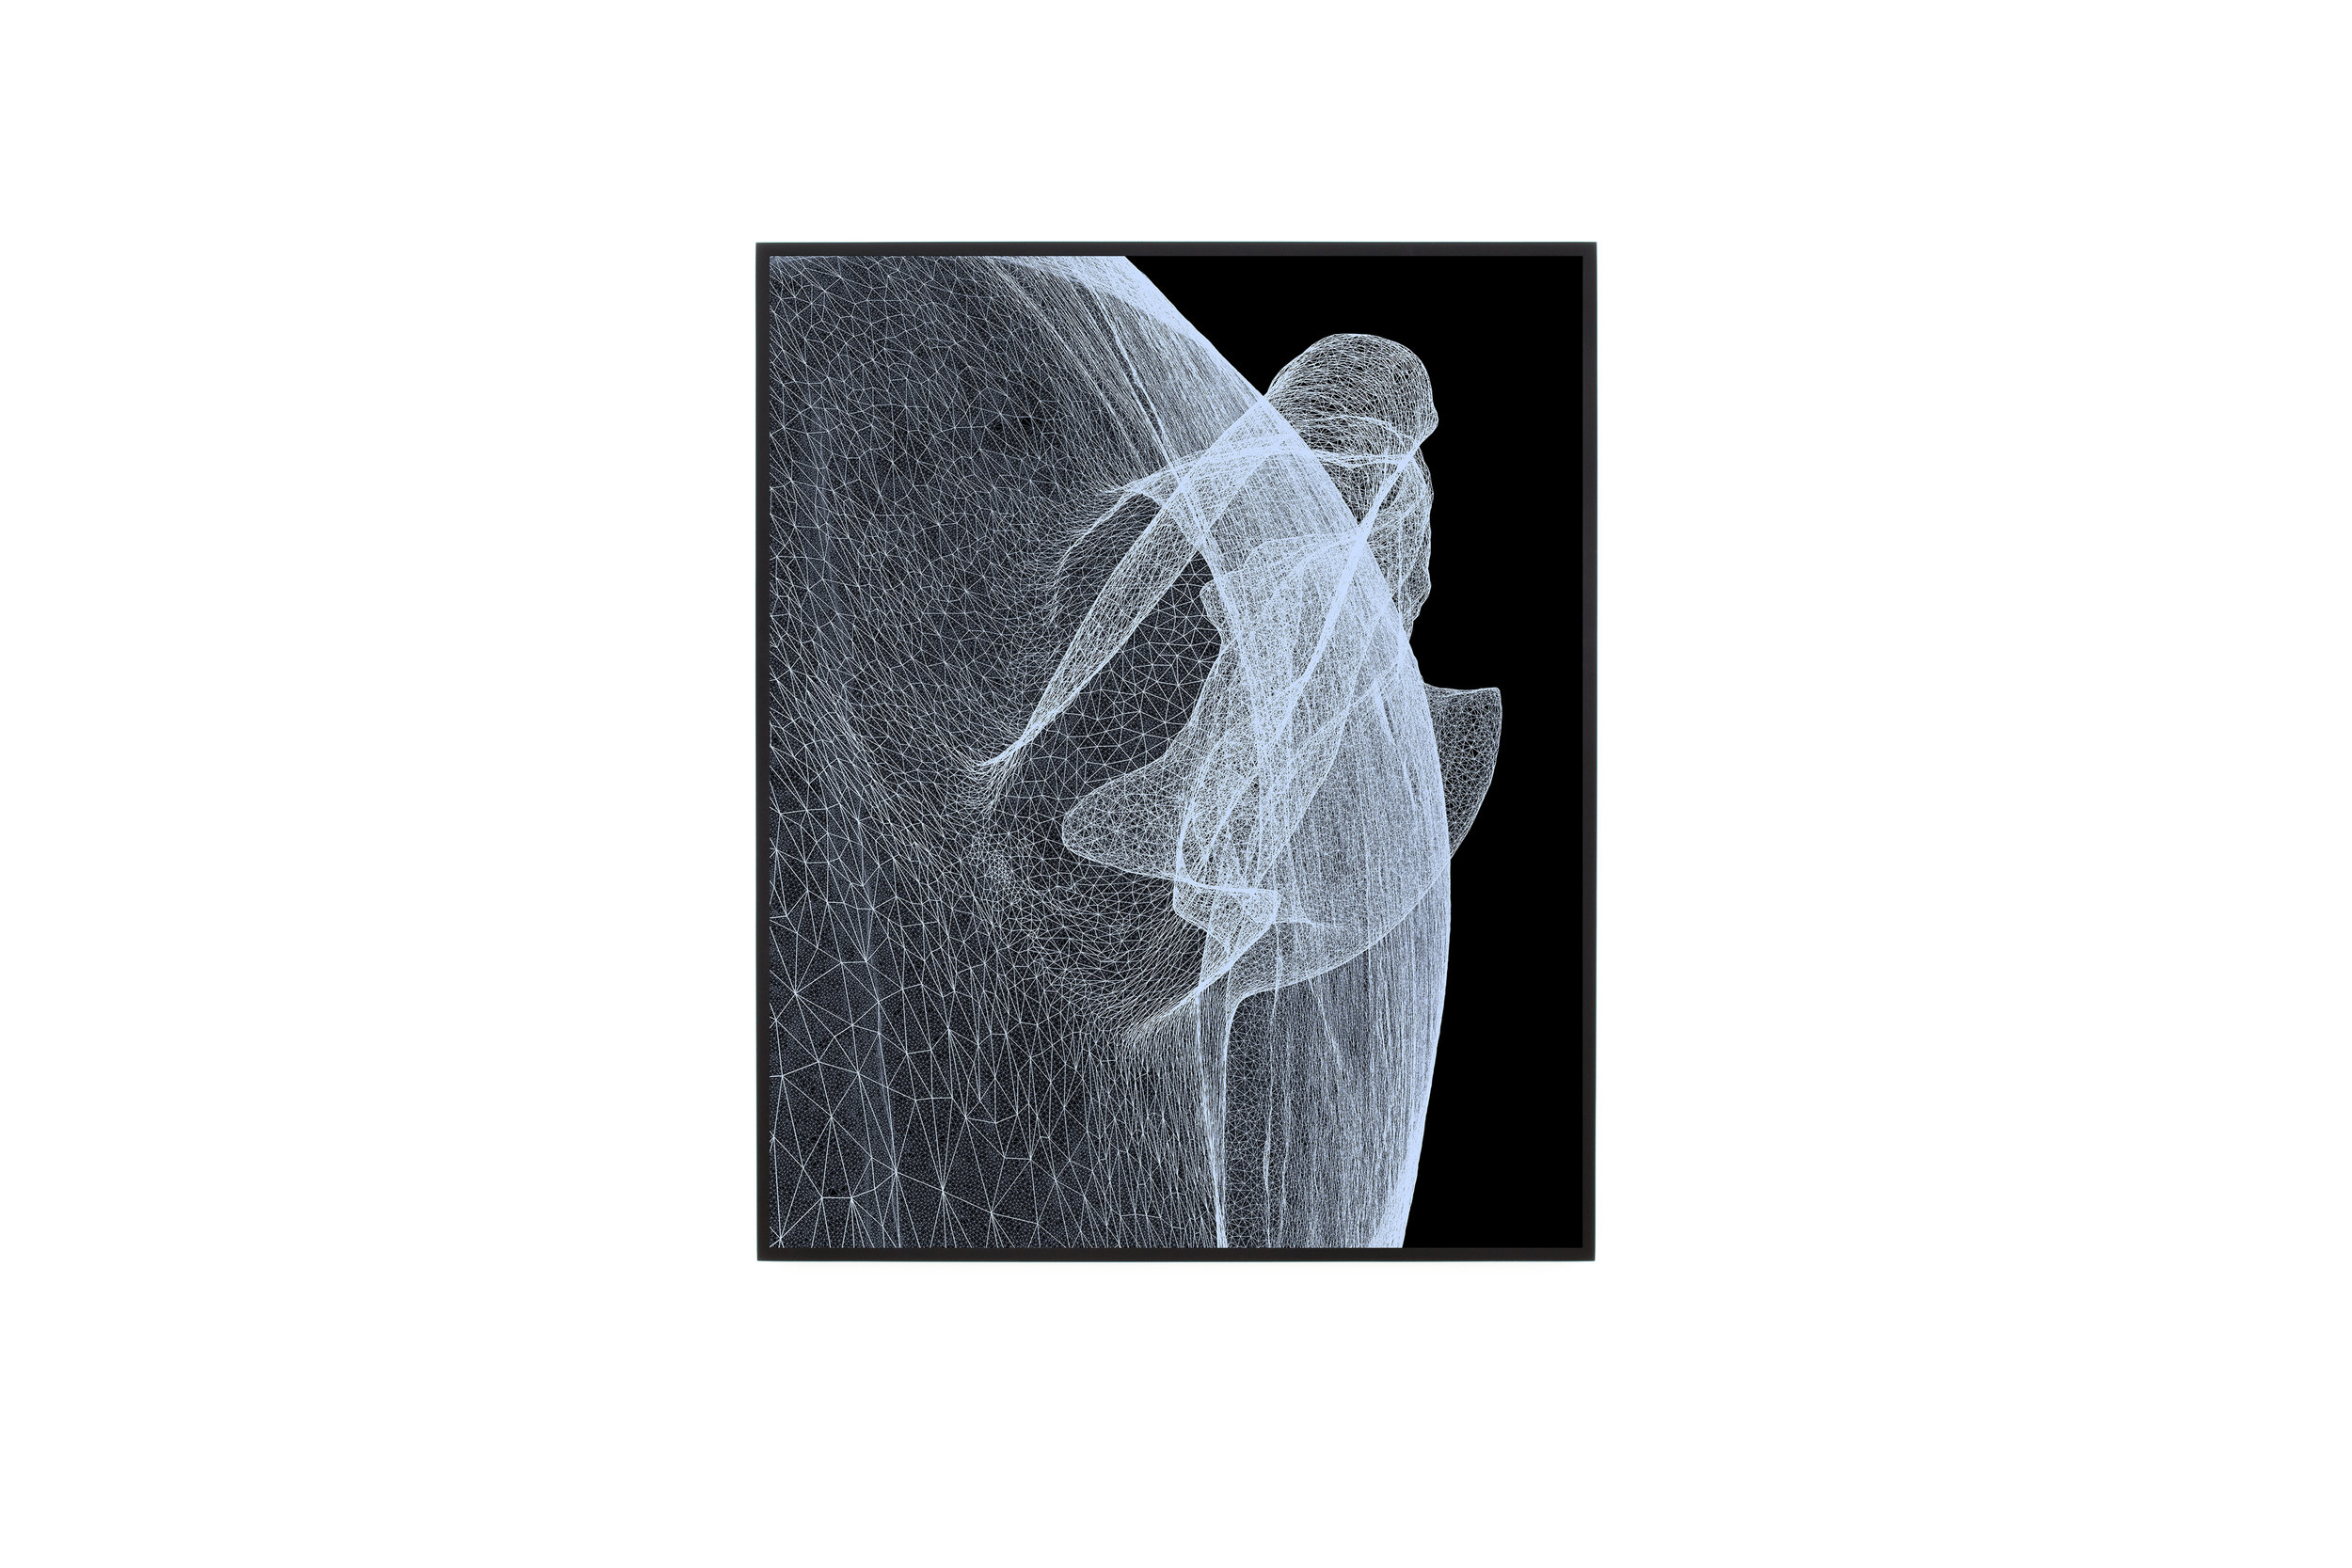 not-a-single-bone-by-nora-al-badri-and-nikolai-nelles_37208500985_o.jpg